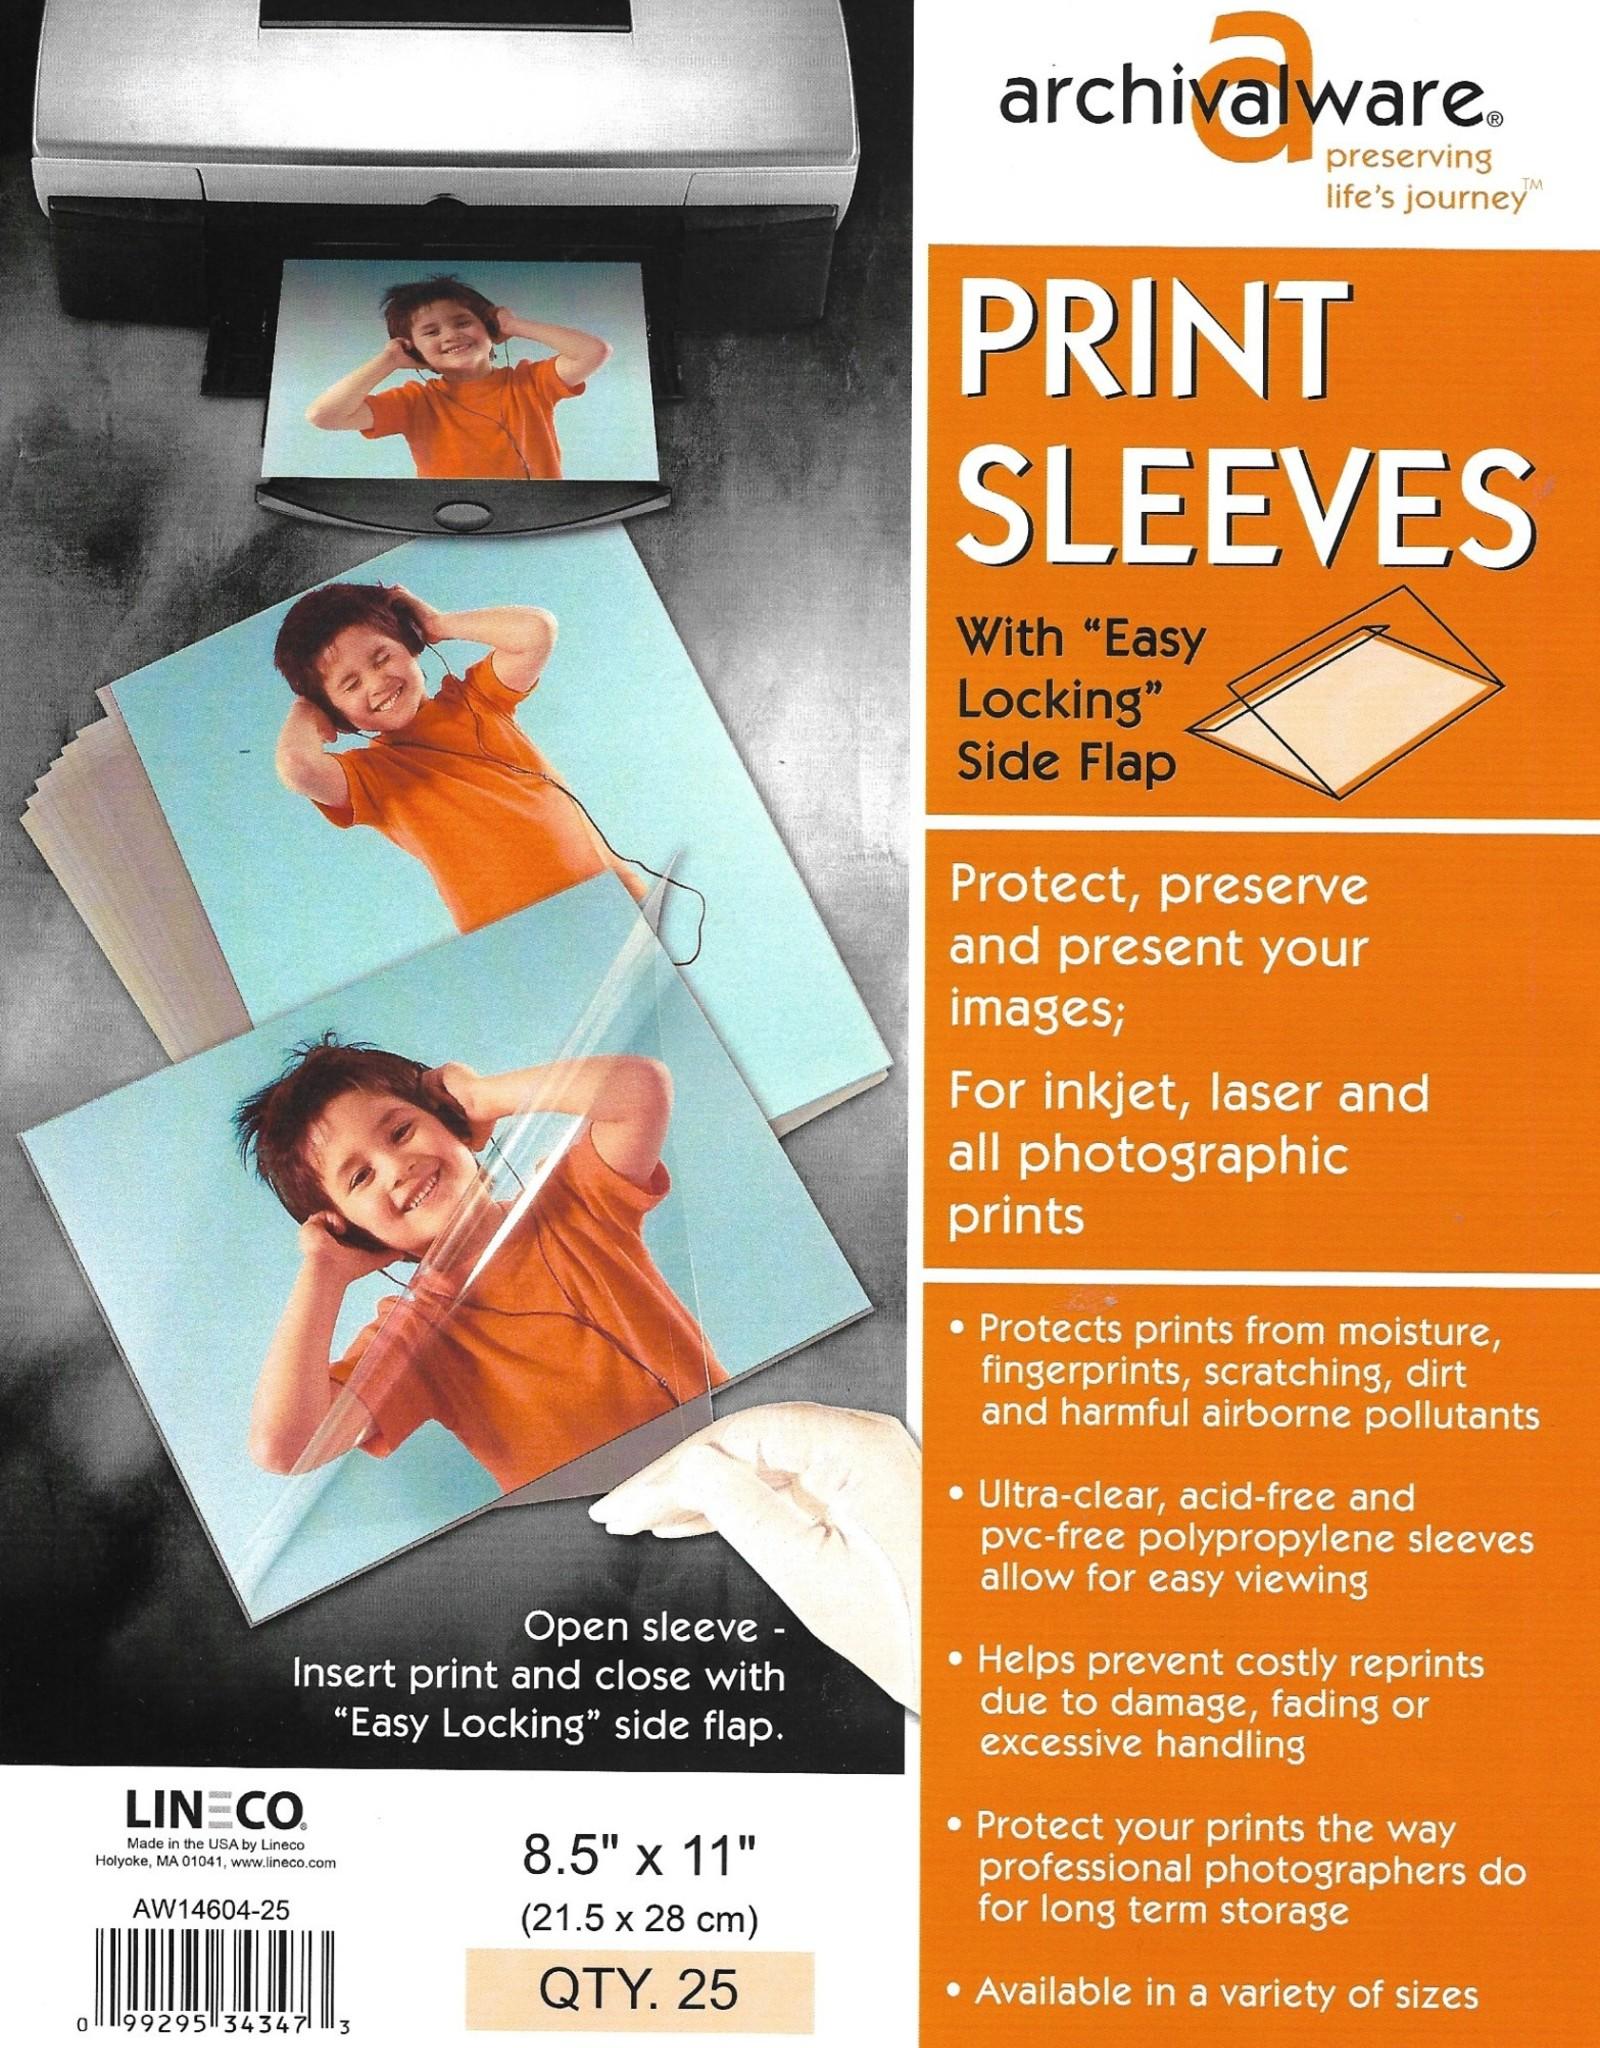 "Archivalware Print Sleeve, Locking Side Flap, 8.5"" x 11"", 25 Sleeves"